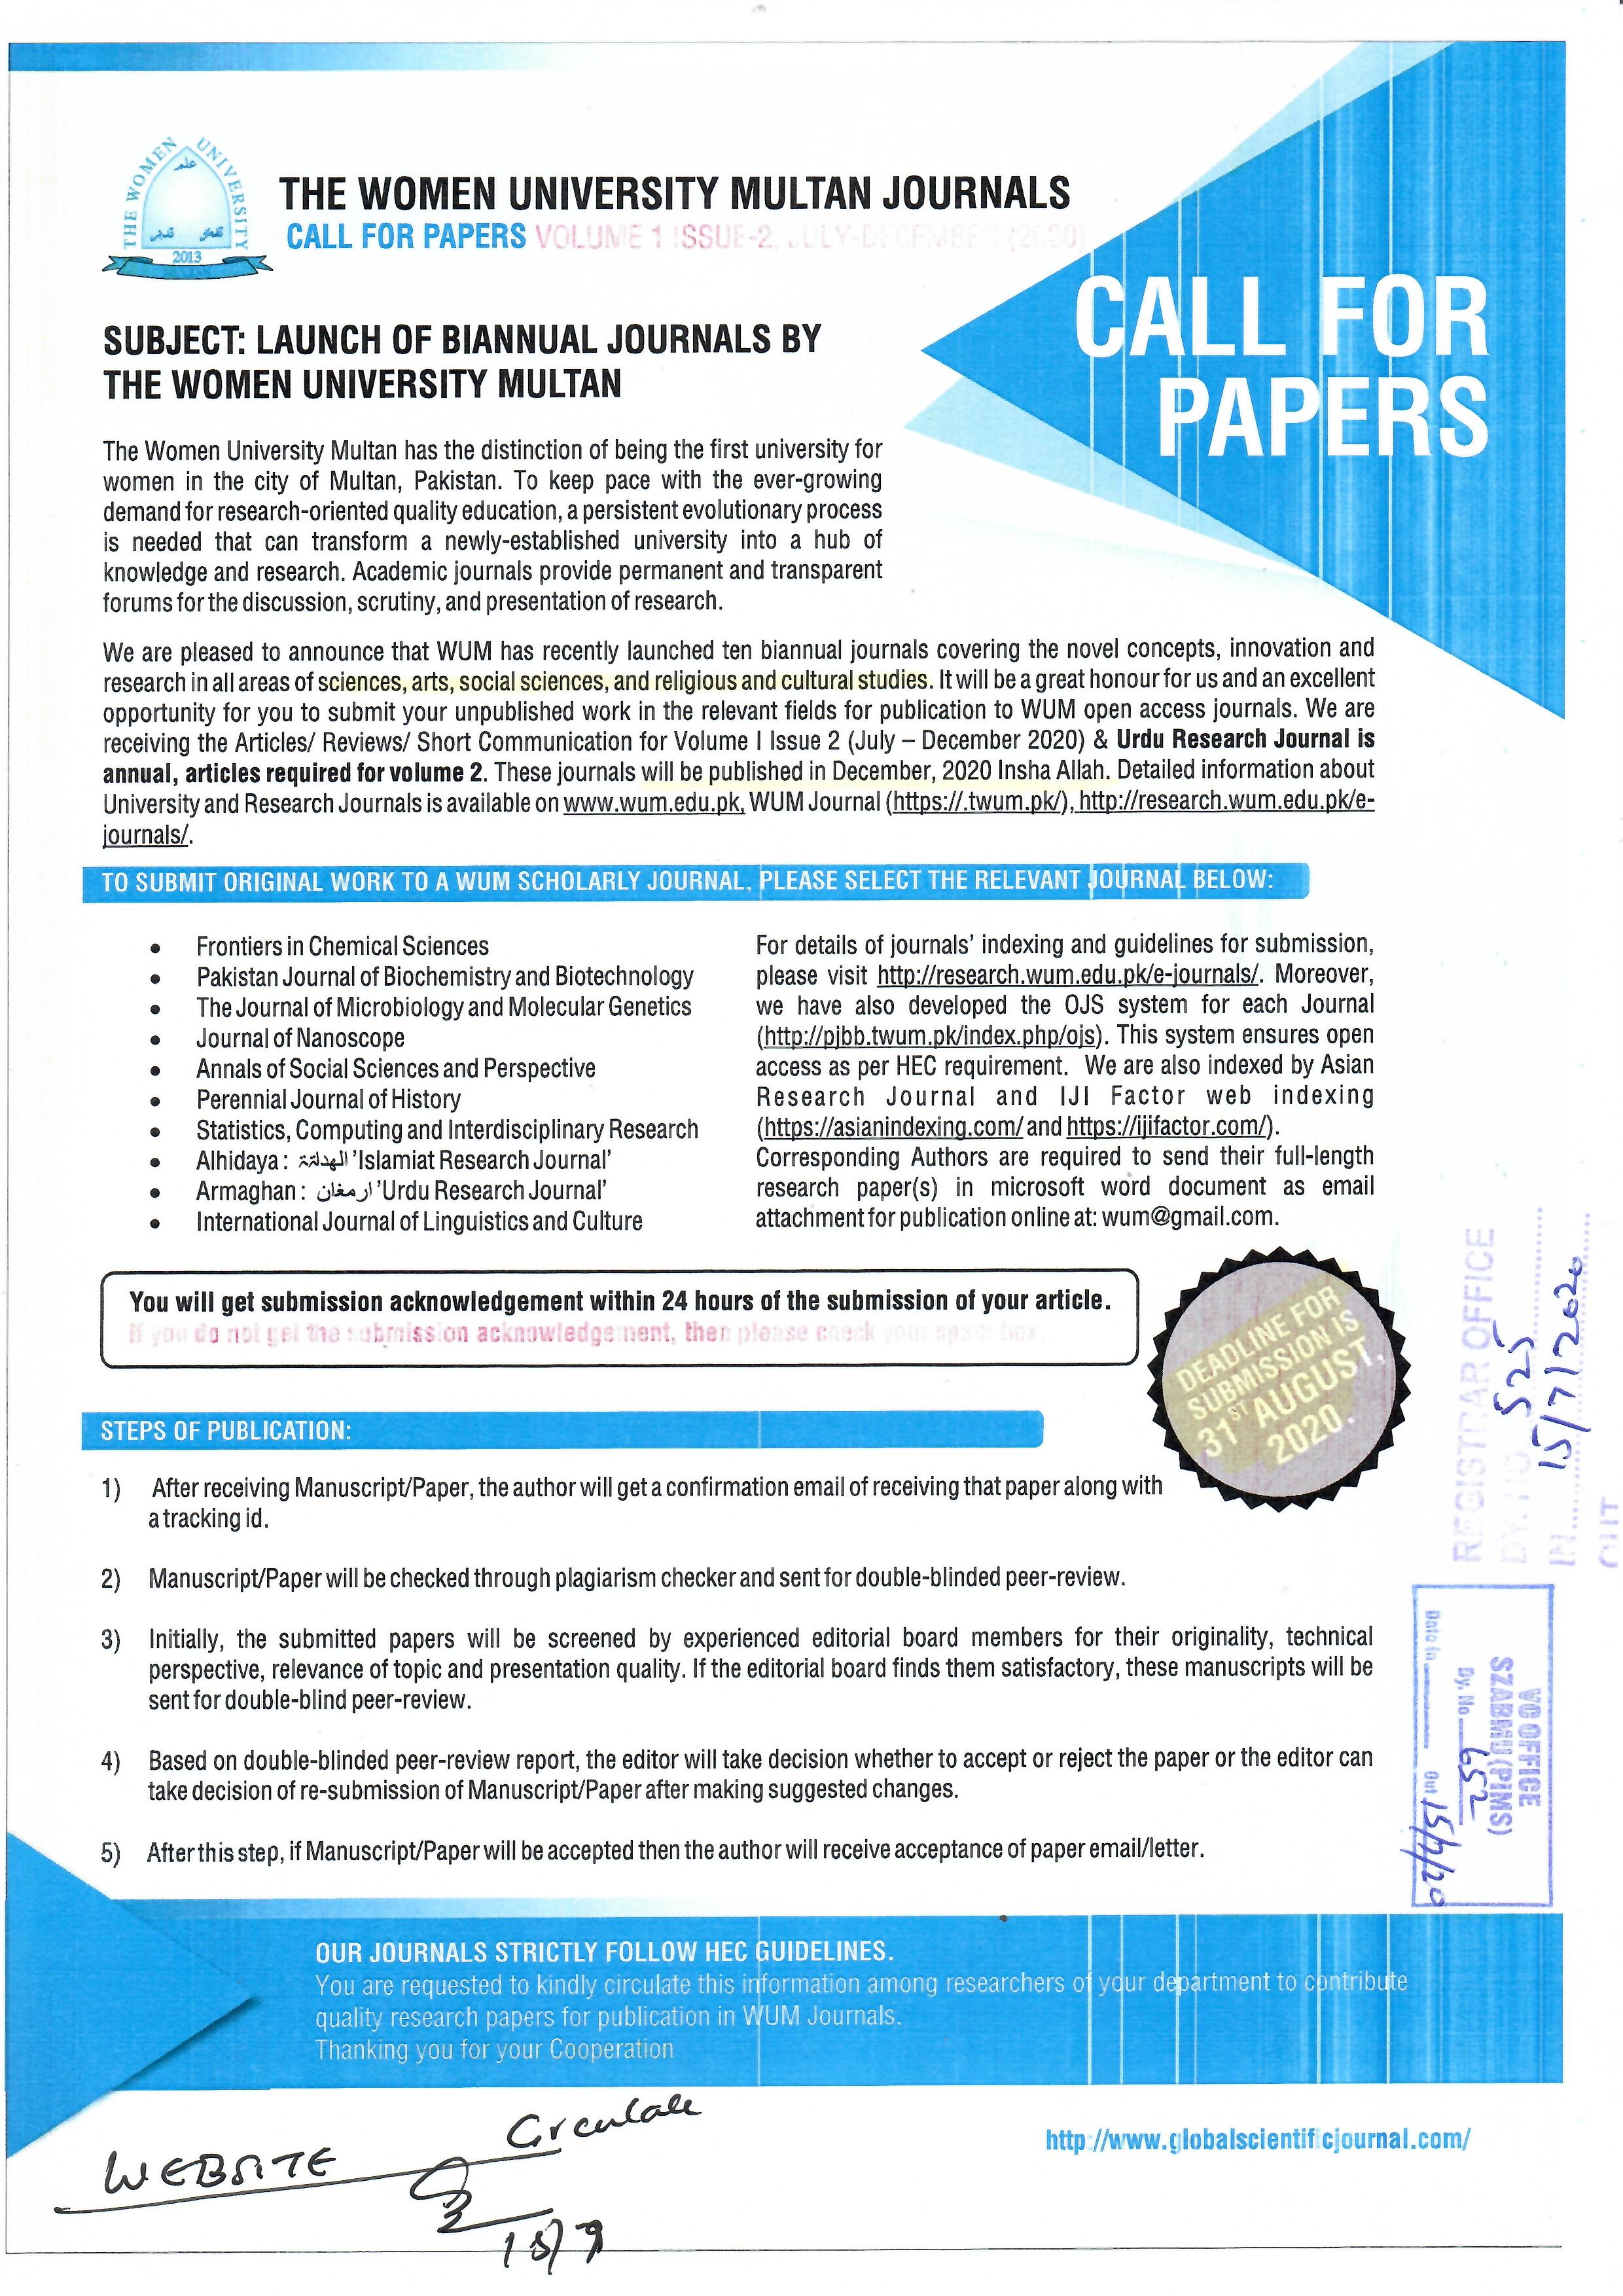 Launch of Biannual Journals by the women University Multan